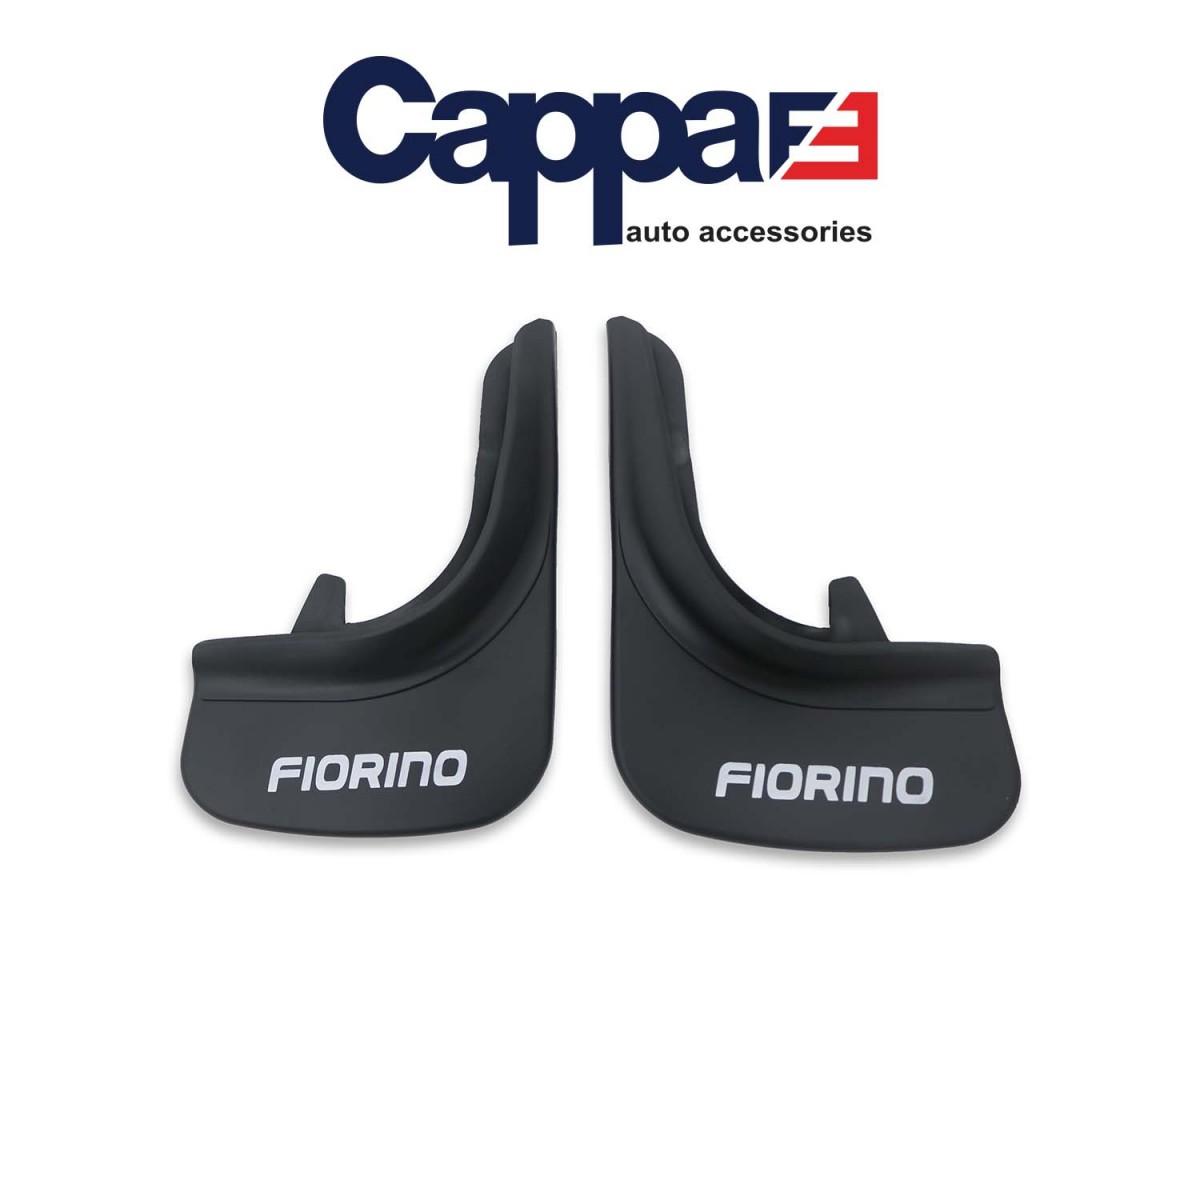 CAPPAFE Fiorino Paçalık Tozluk Set 2 Parça Bütün Modellere Uyumlu